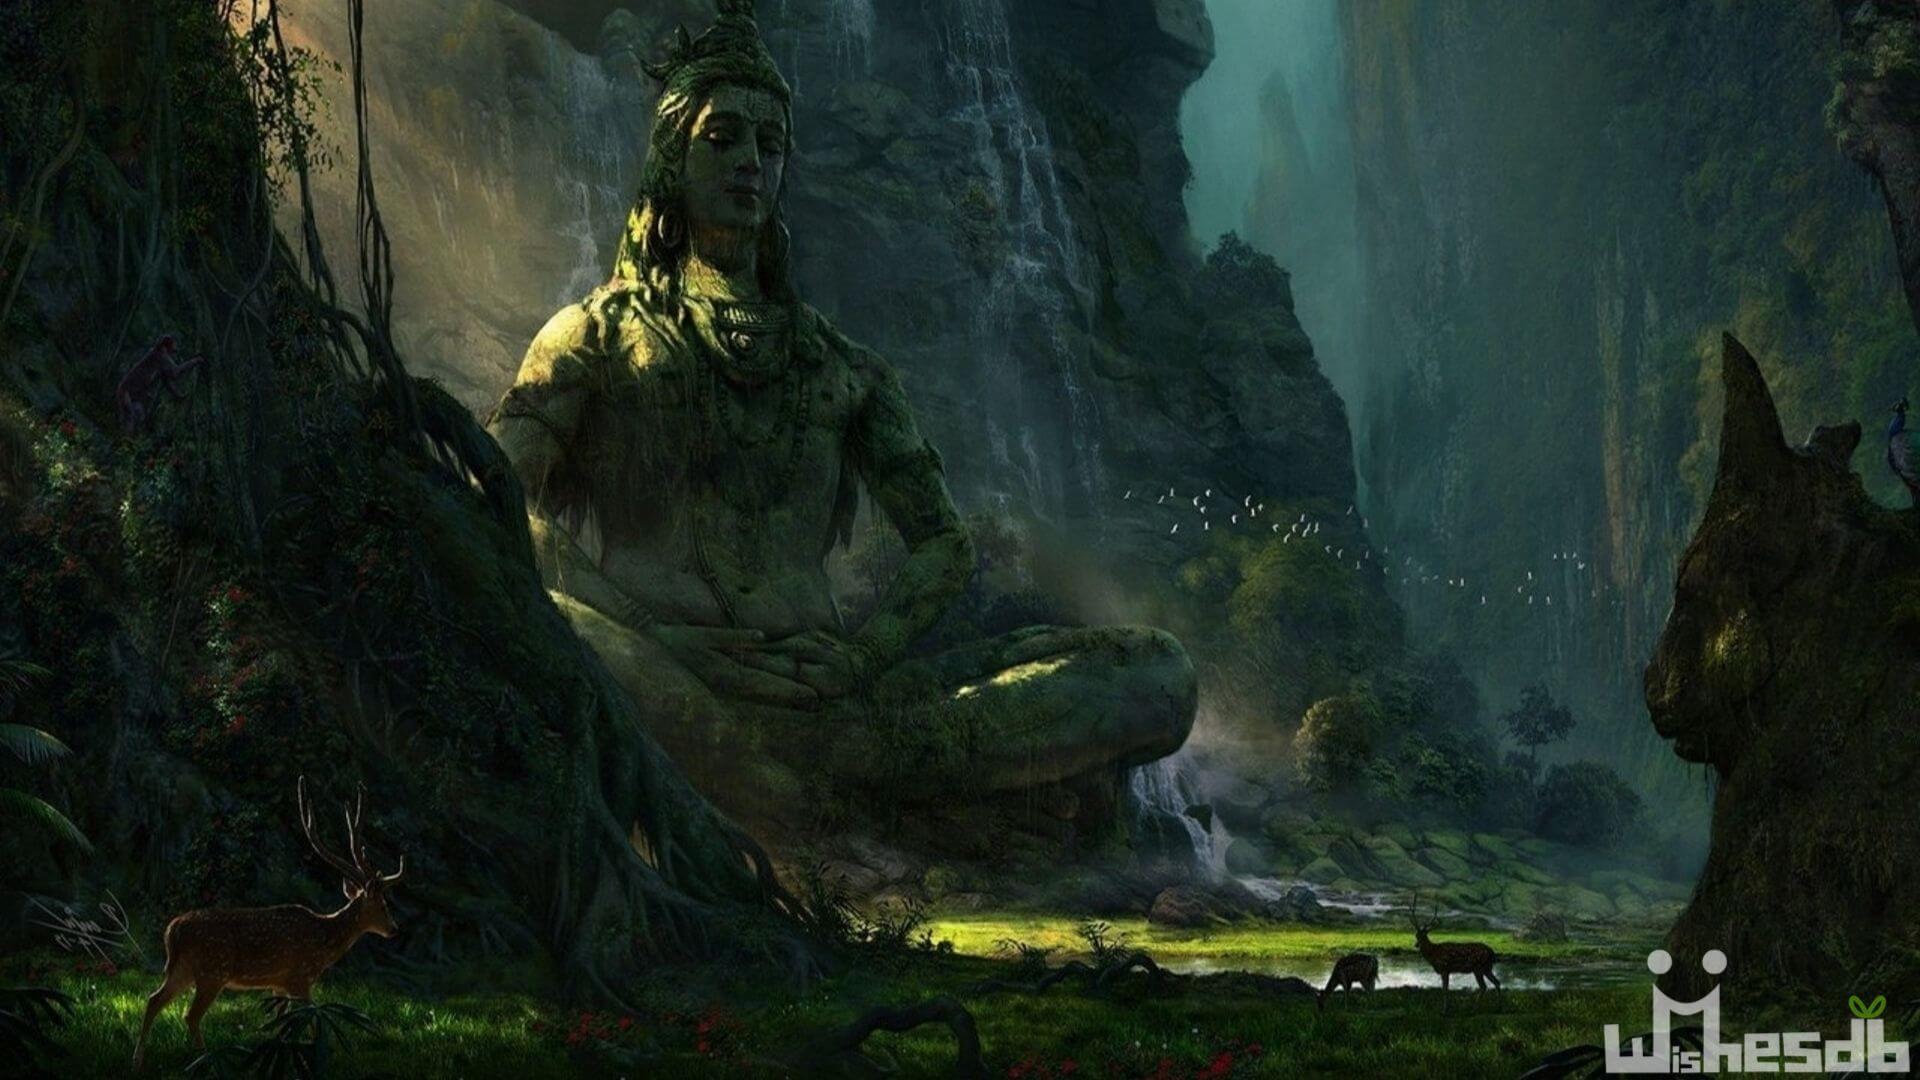 Desktop Lord Shiva Wallpapers Wallpaper Cave